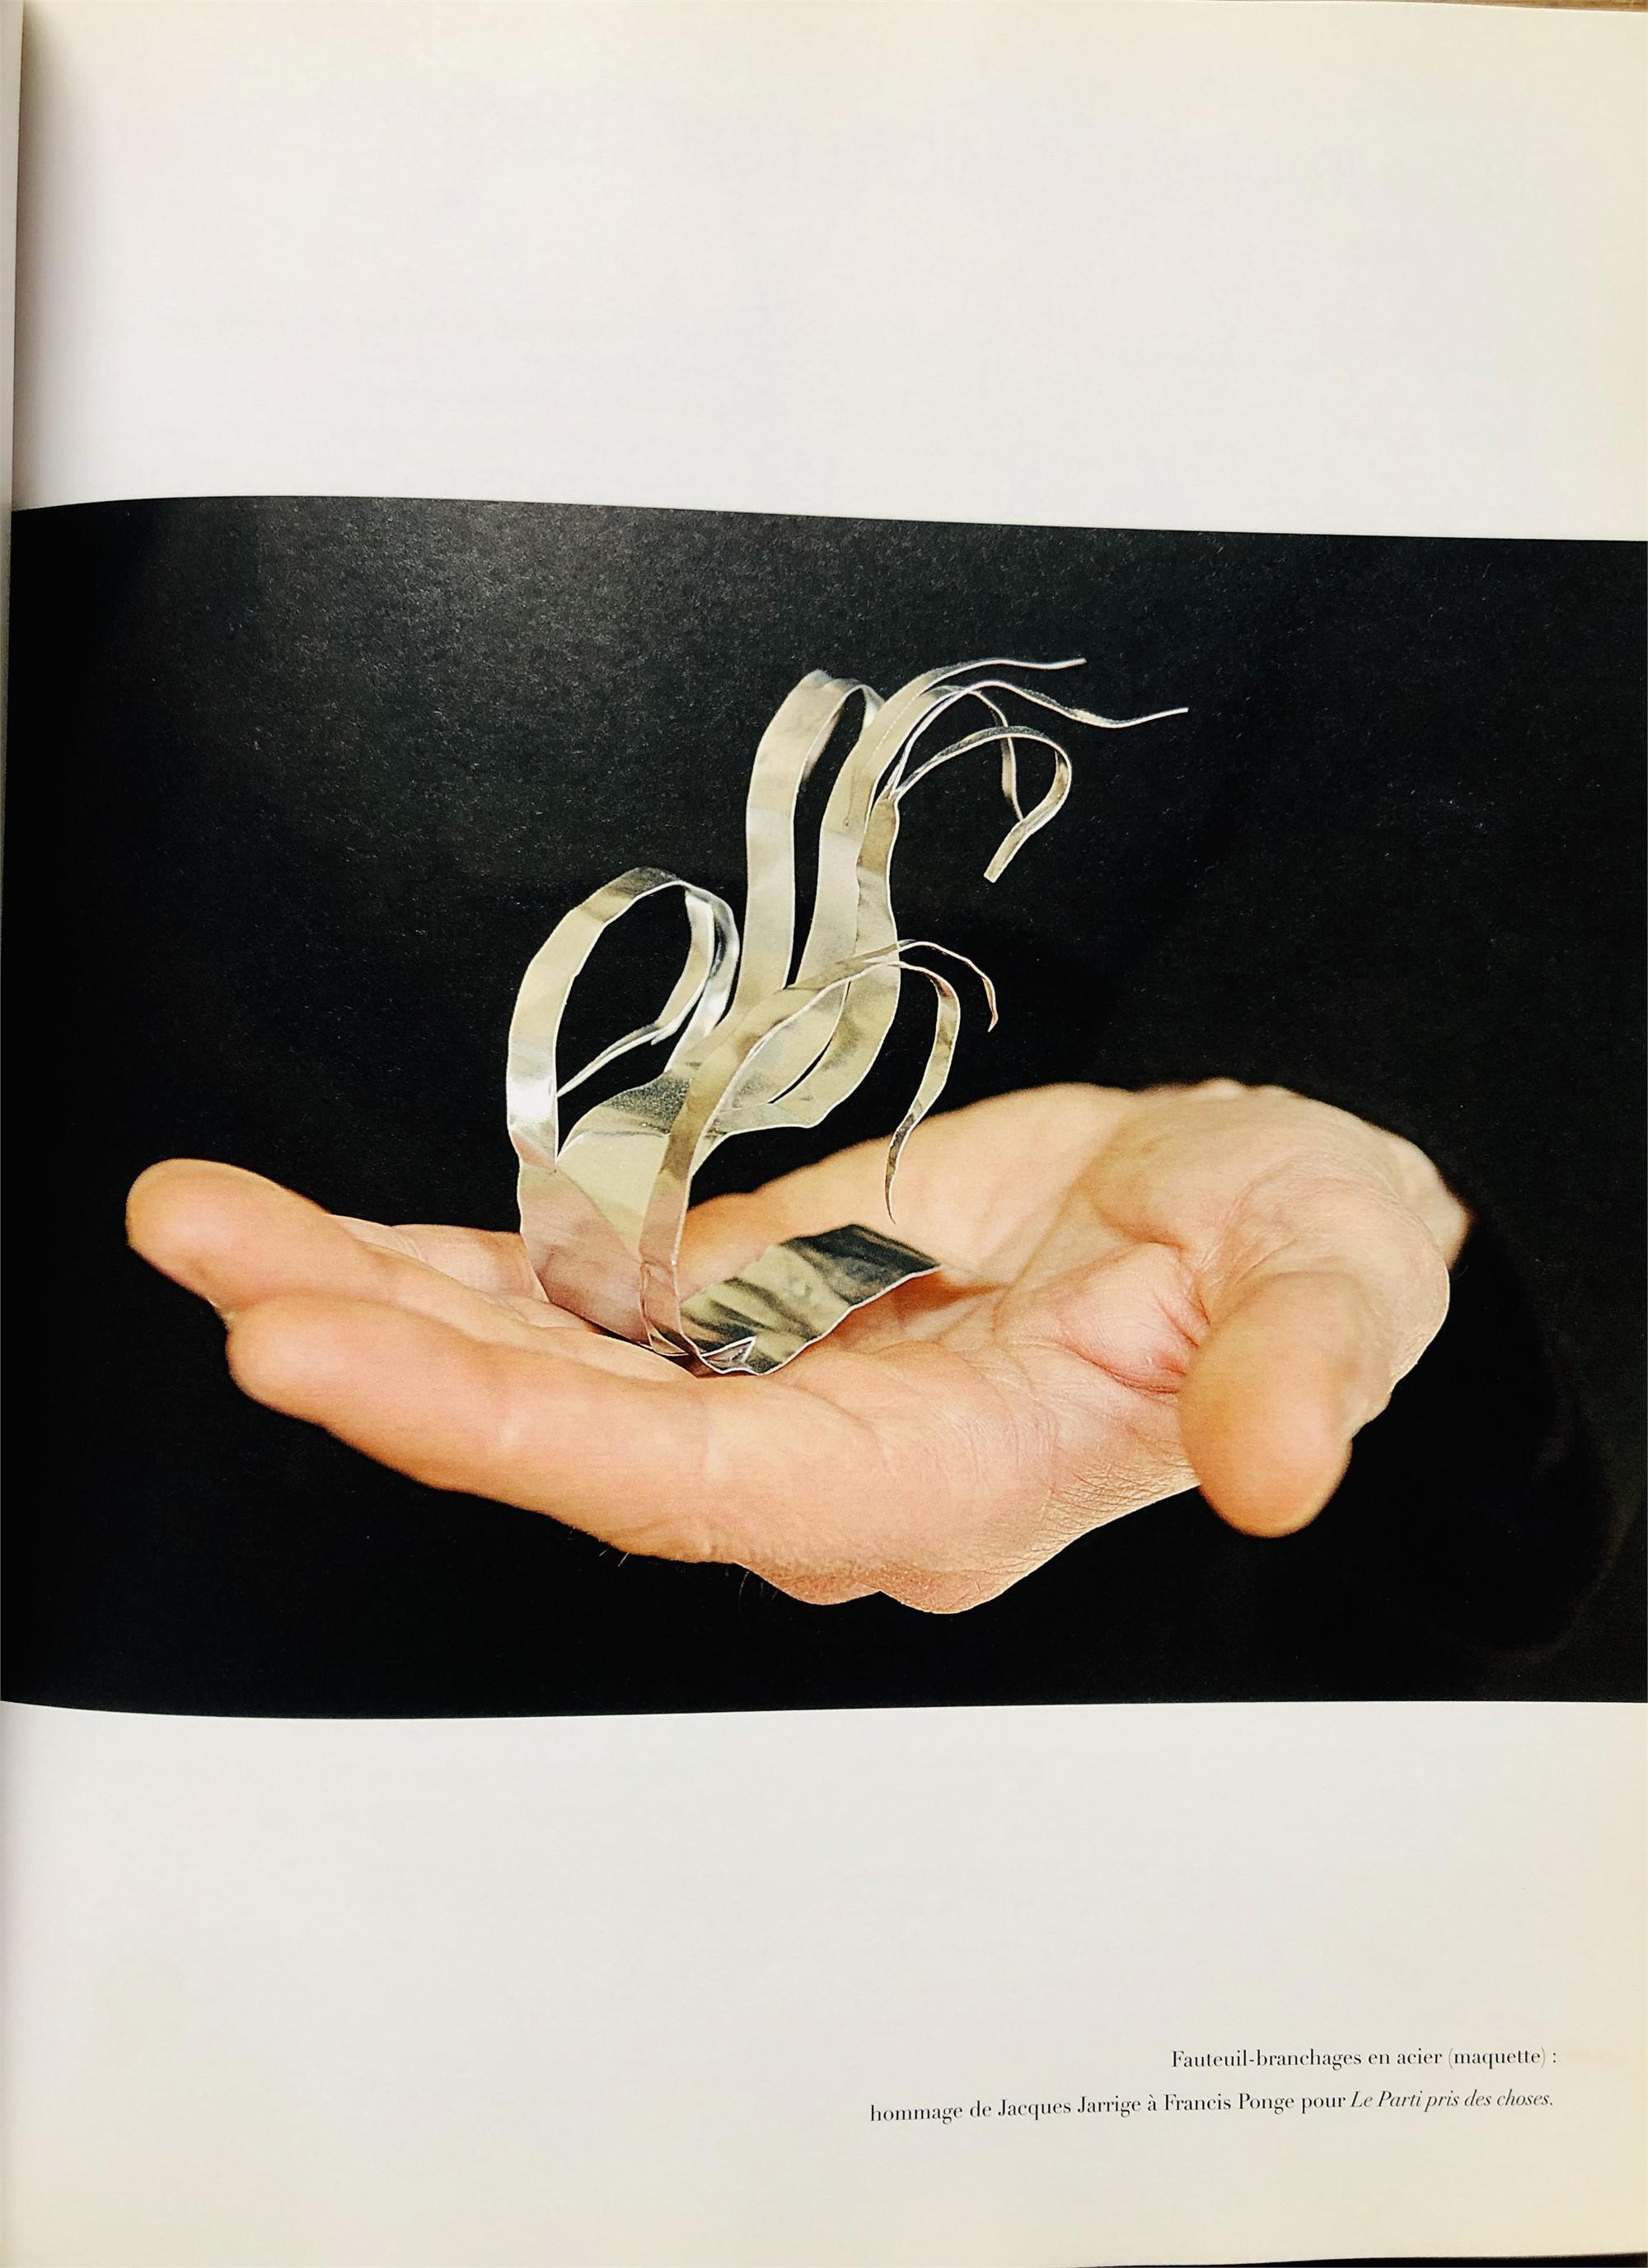 Jacques Jarrige, Design & Litterature by Esther Henwood